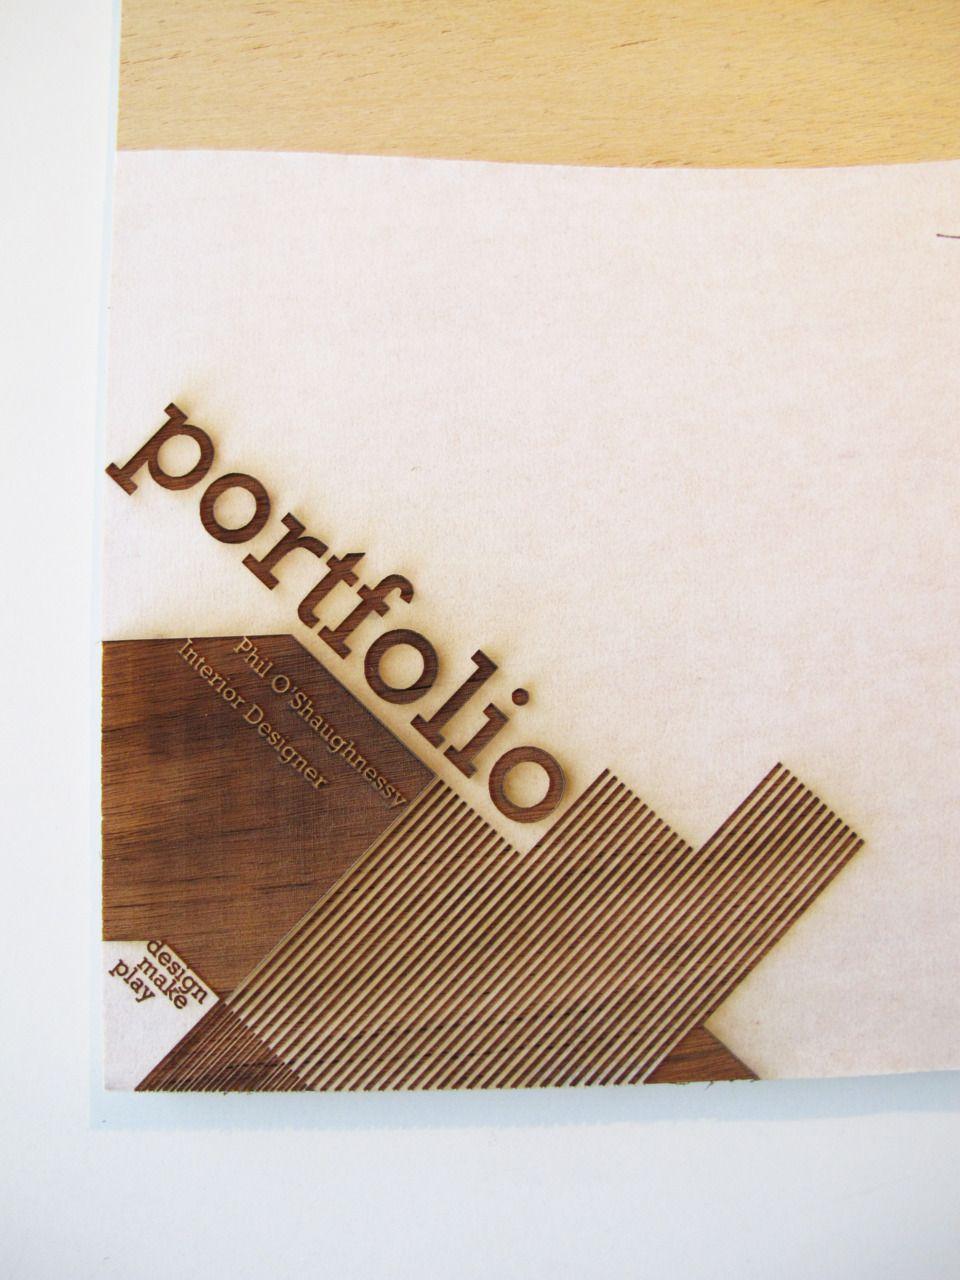 brilliant portfolio cover we burnt into plywood protective tape prevents the oils and burn marks - Design Portfolio Ideas